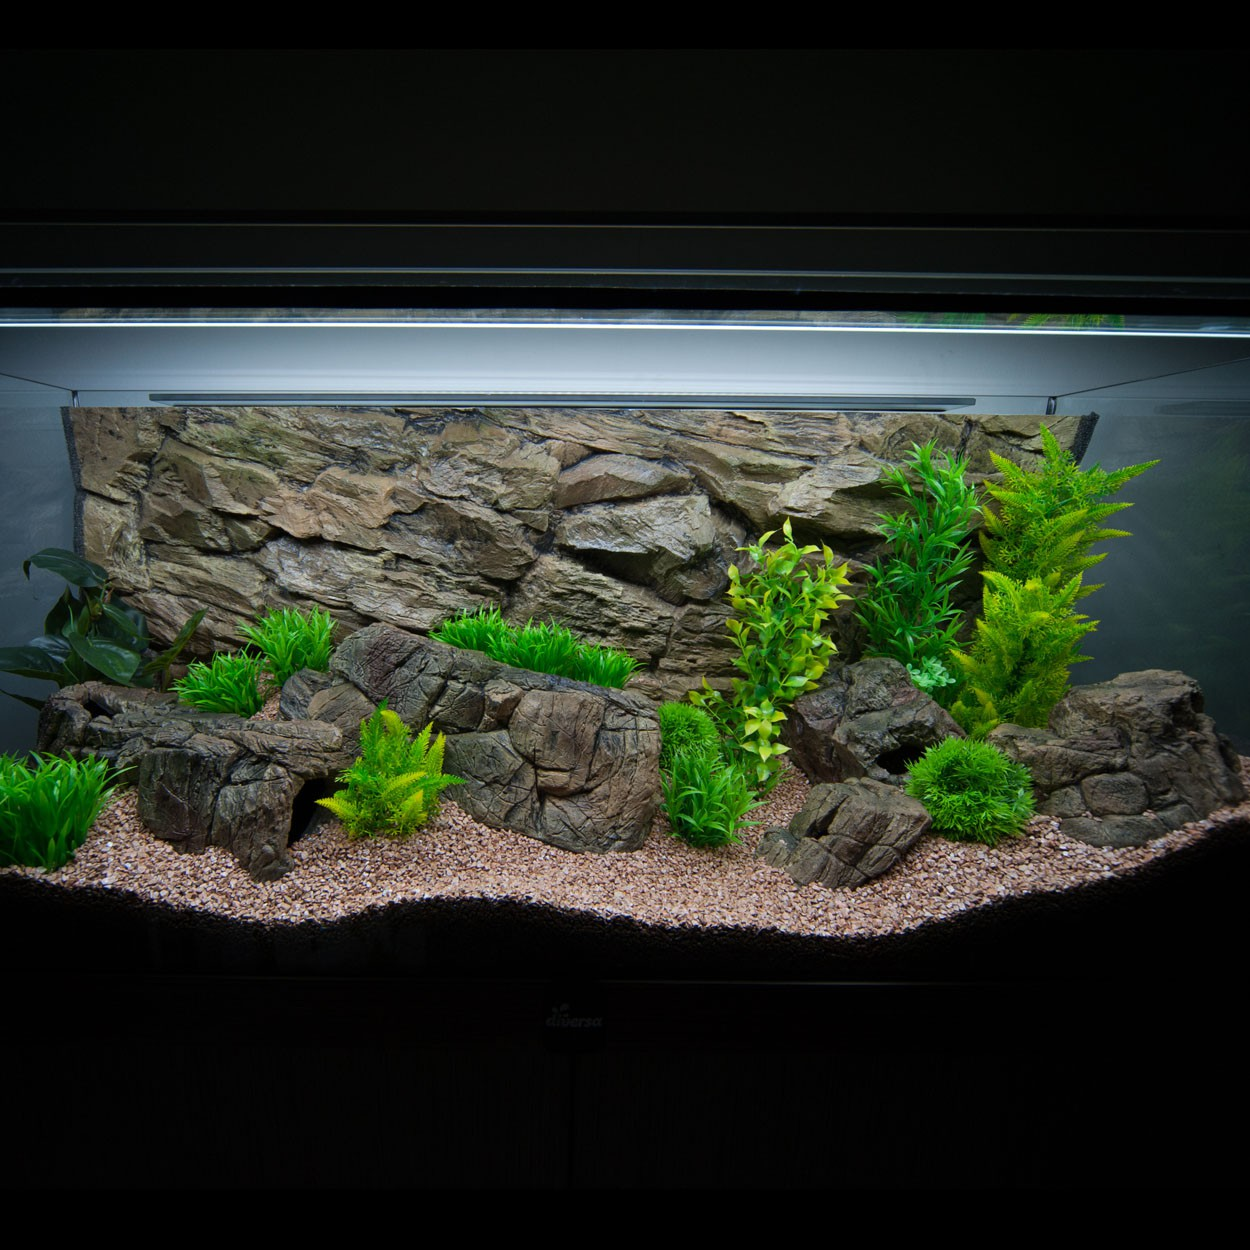 3d aquarium r ckwand f r vision 450 s line fif aquaristik. Black Bedroom Furniture Sets. Home Design Ideas